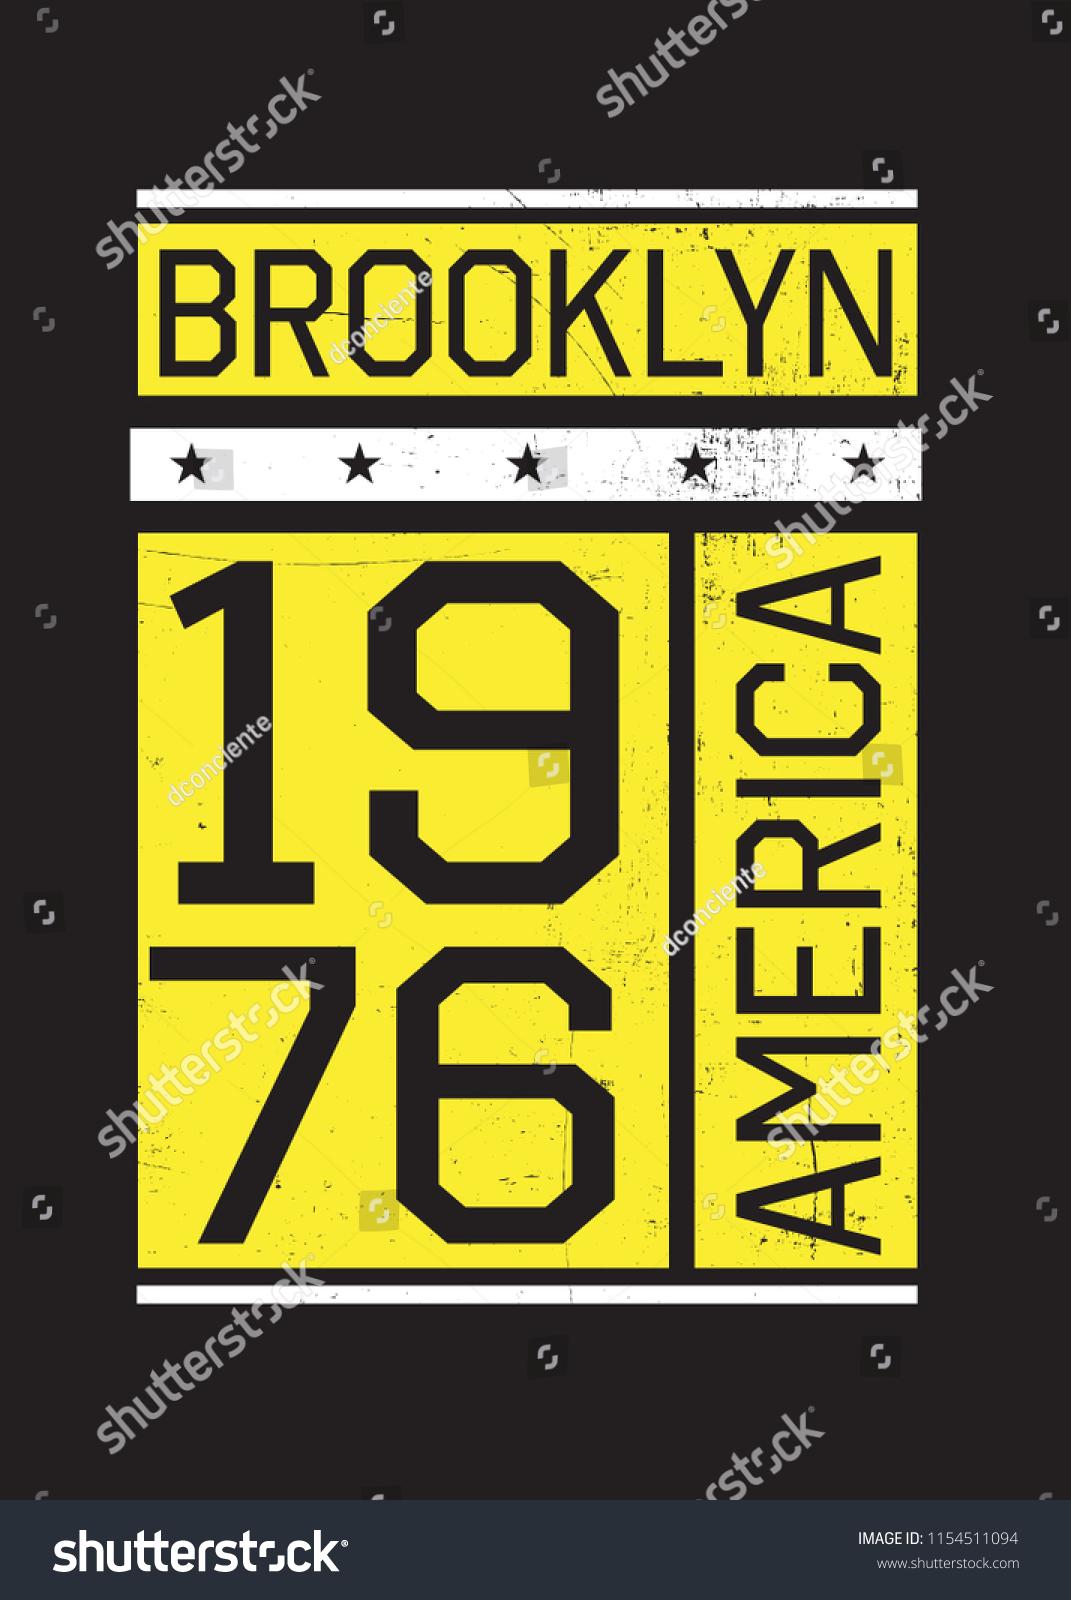 f6d6daa0 brooklyn new york america varsity urban design fashion apparel distressed -  Vector